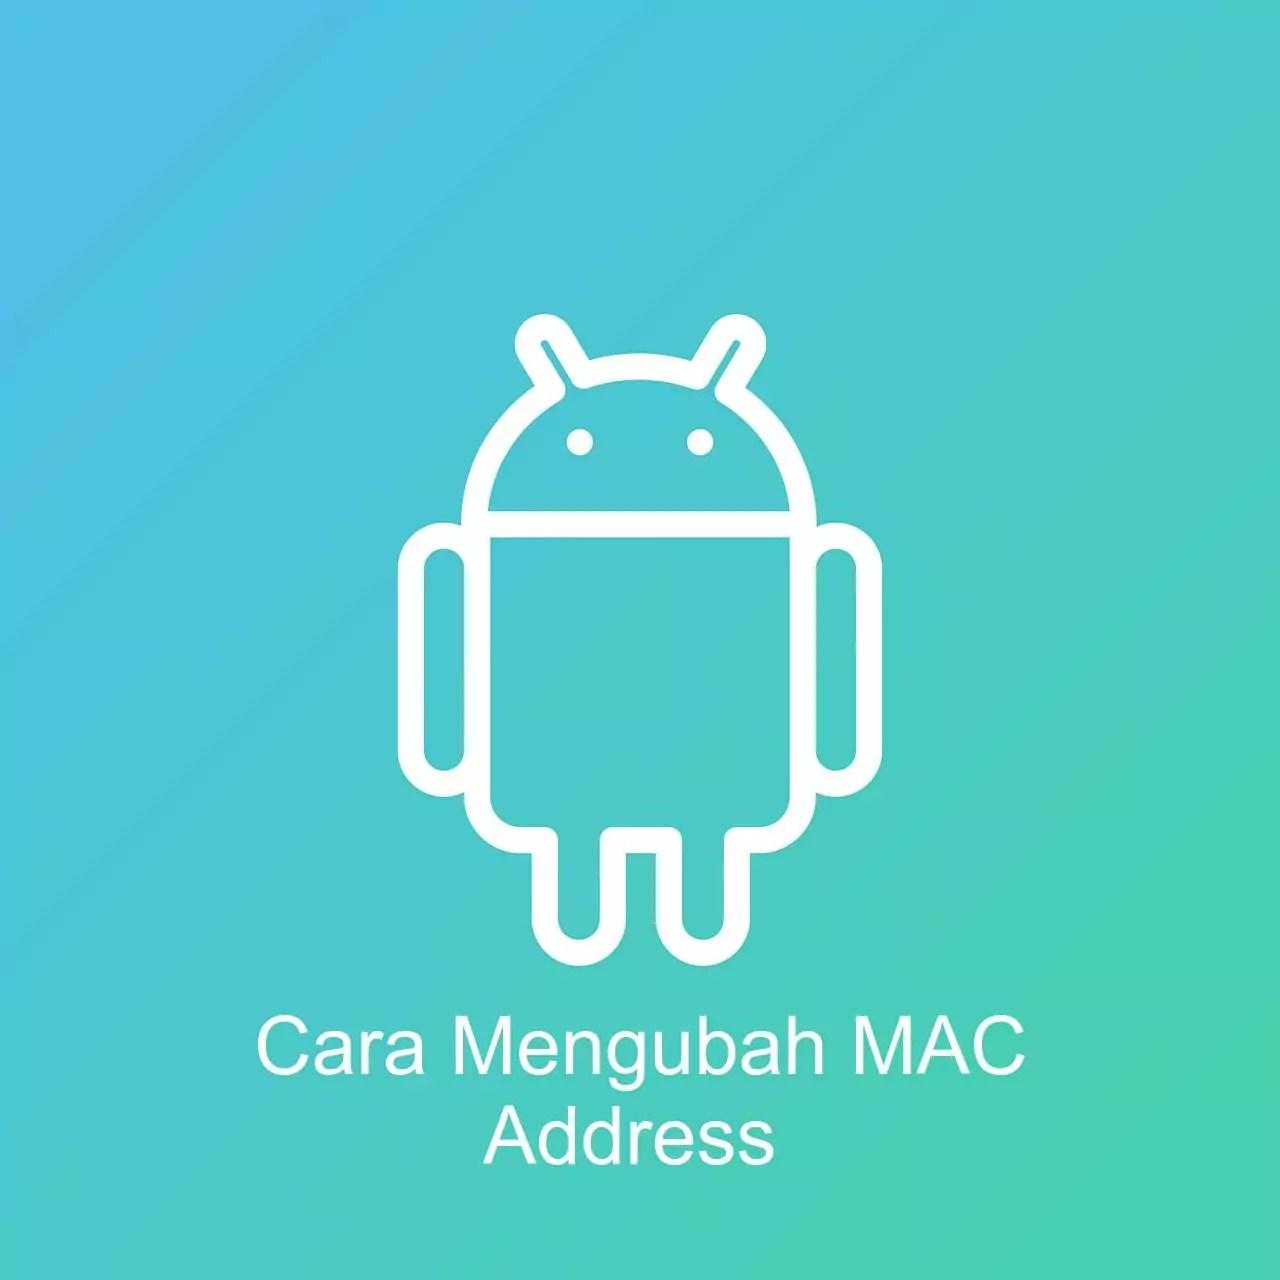 cara mengganti mac address android